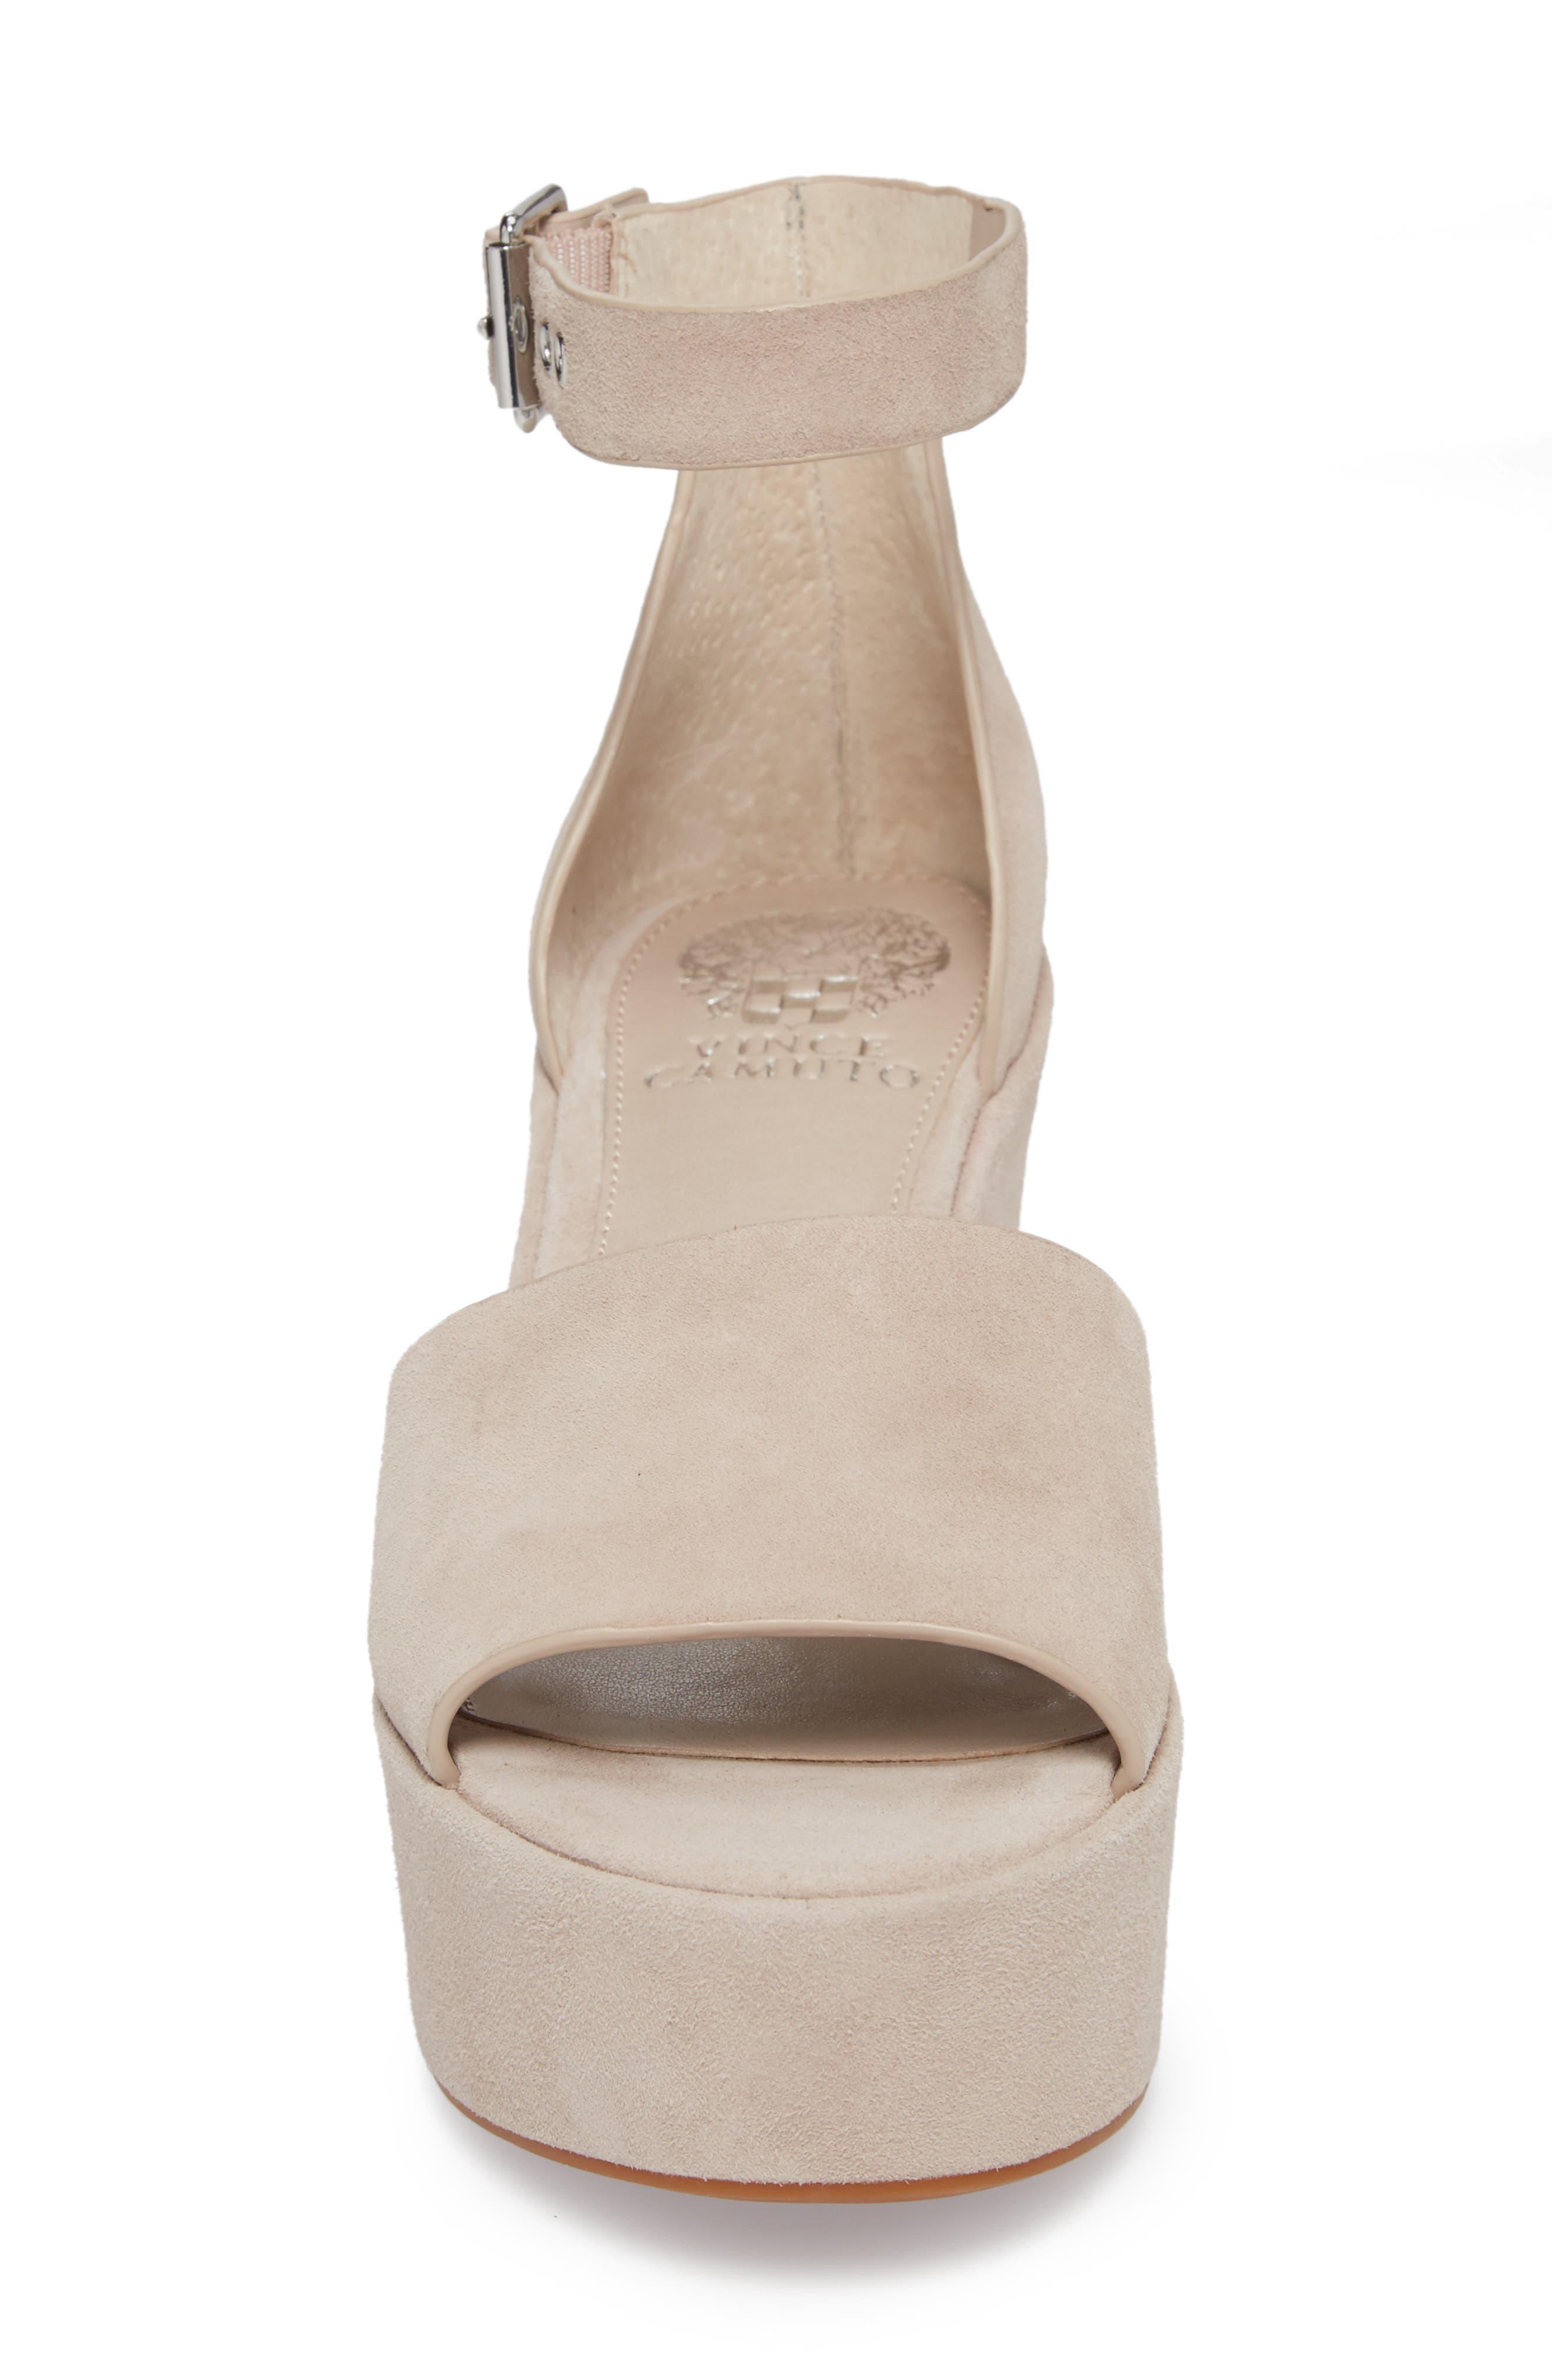 Korista Platform Sandal,                             Alternate thumbnail 4, color,                             Tipsy Taupe Suede